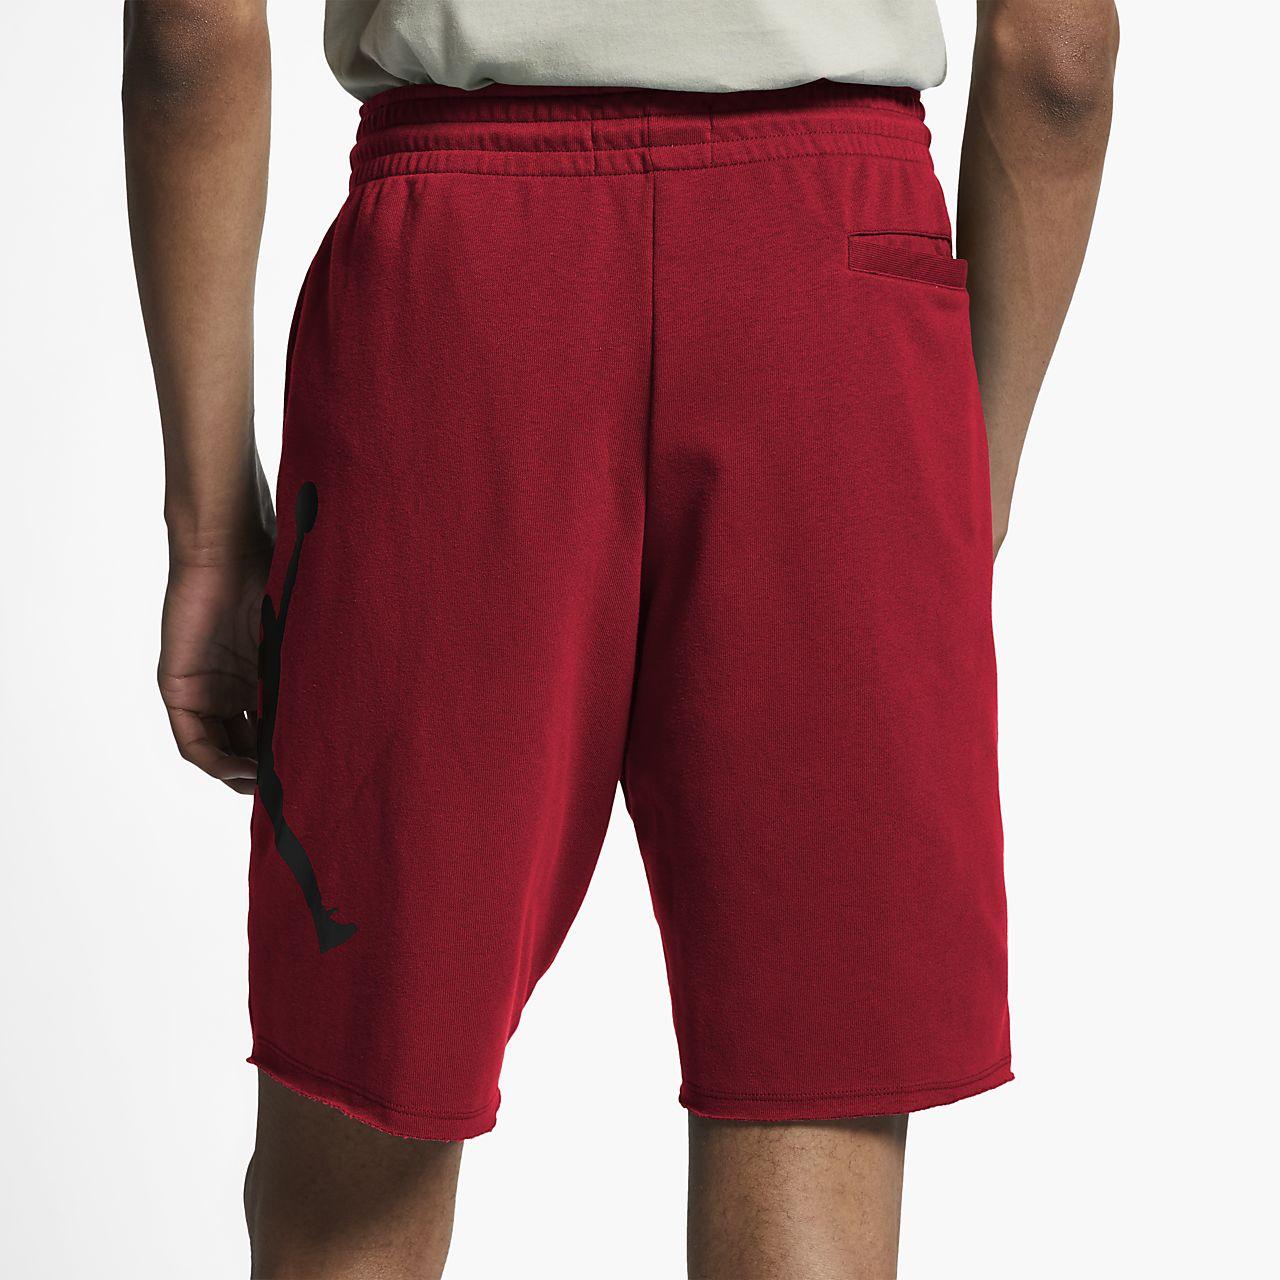 927b0d2ec99dbe Jordan Jumpman Logo Men s Fleece Shorts. Nike.com SE